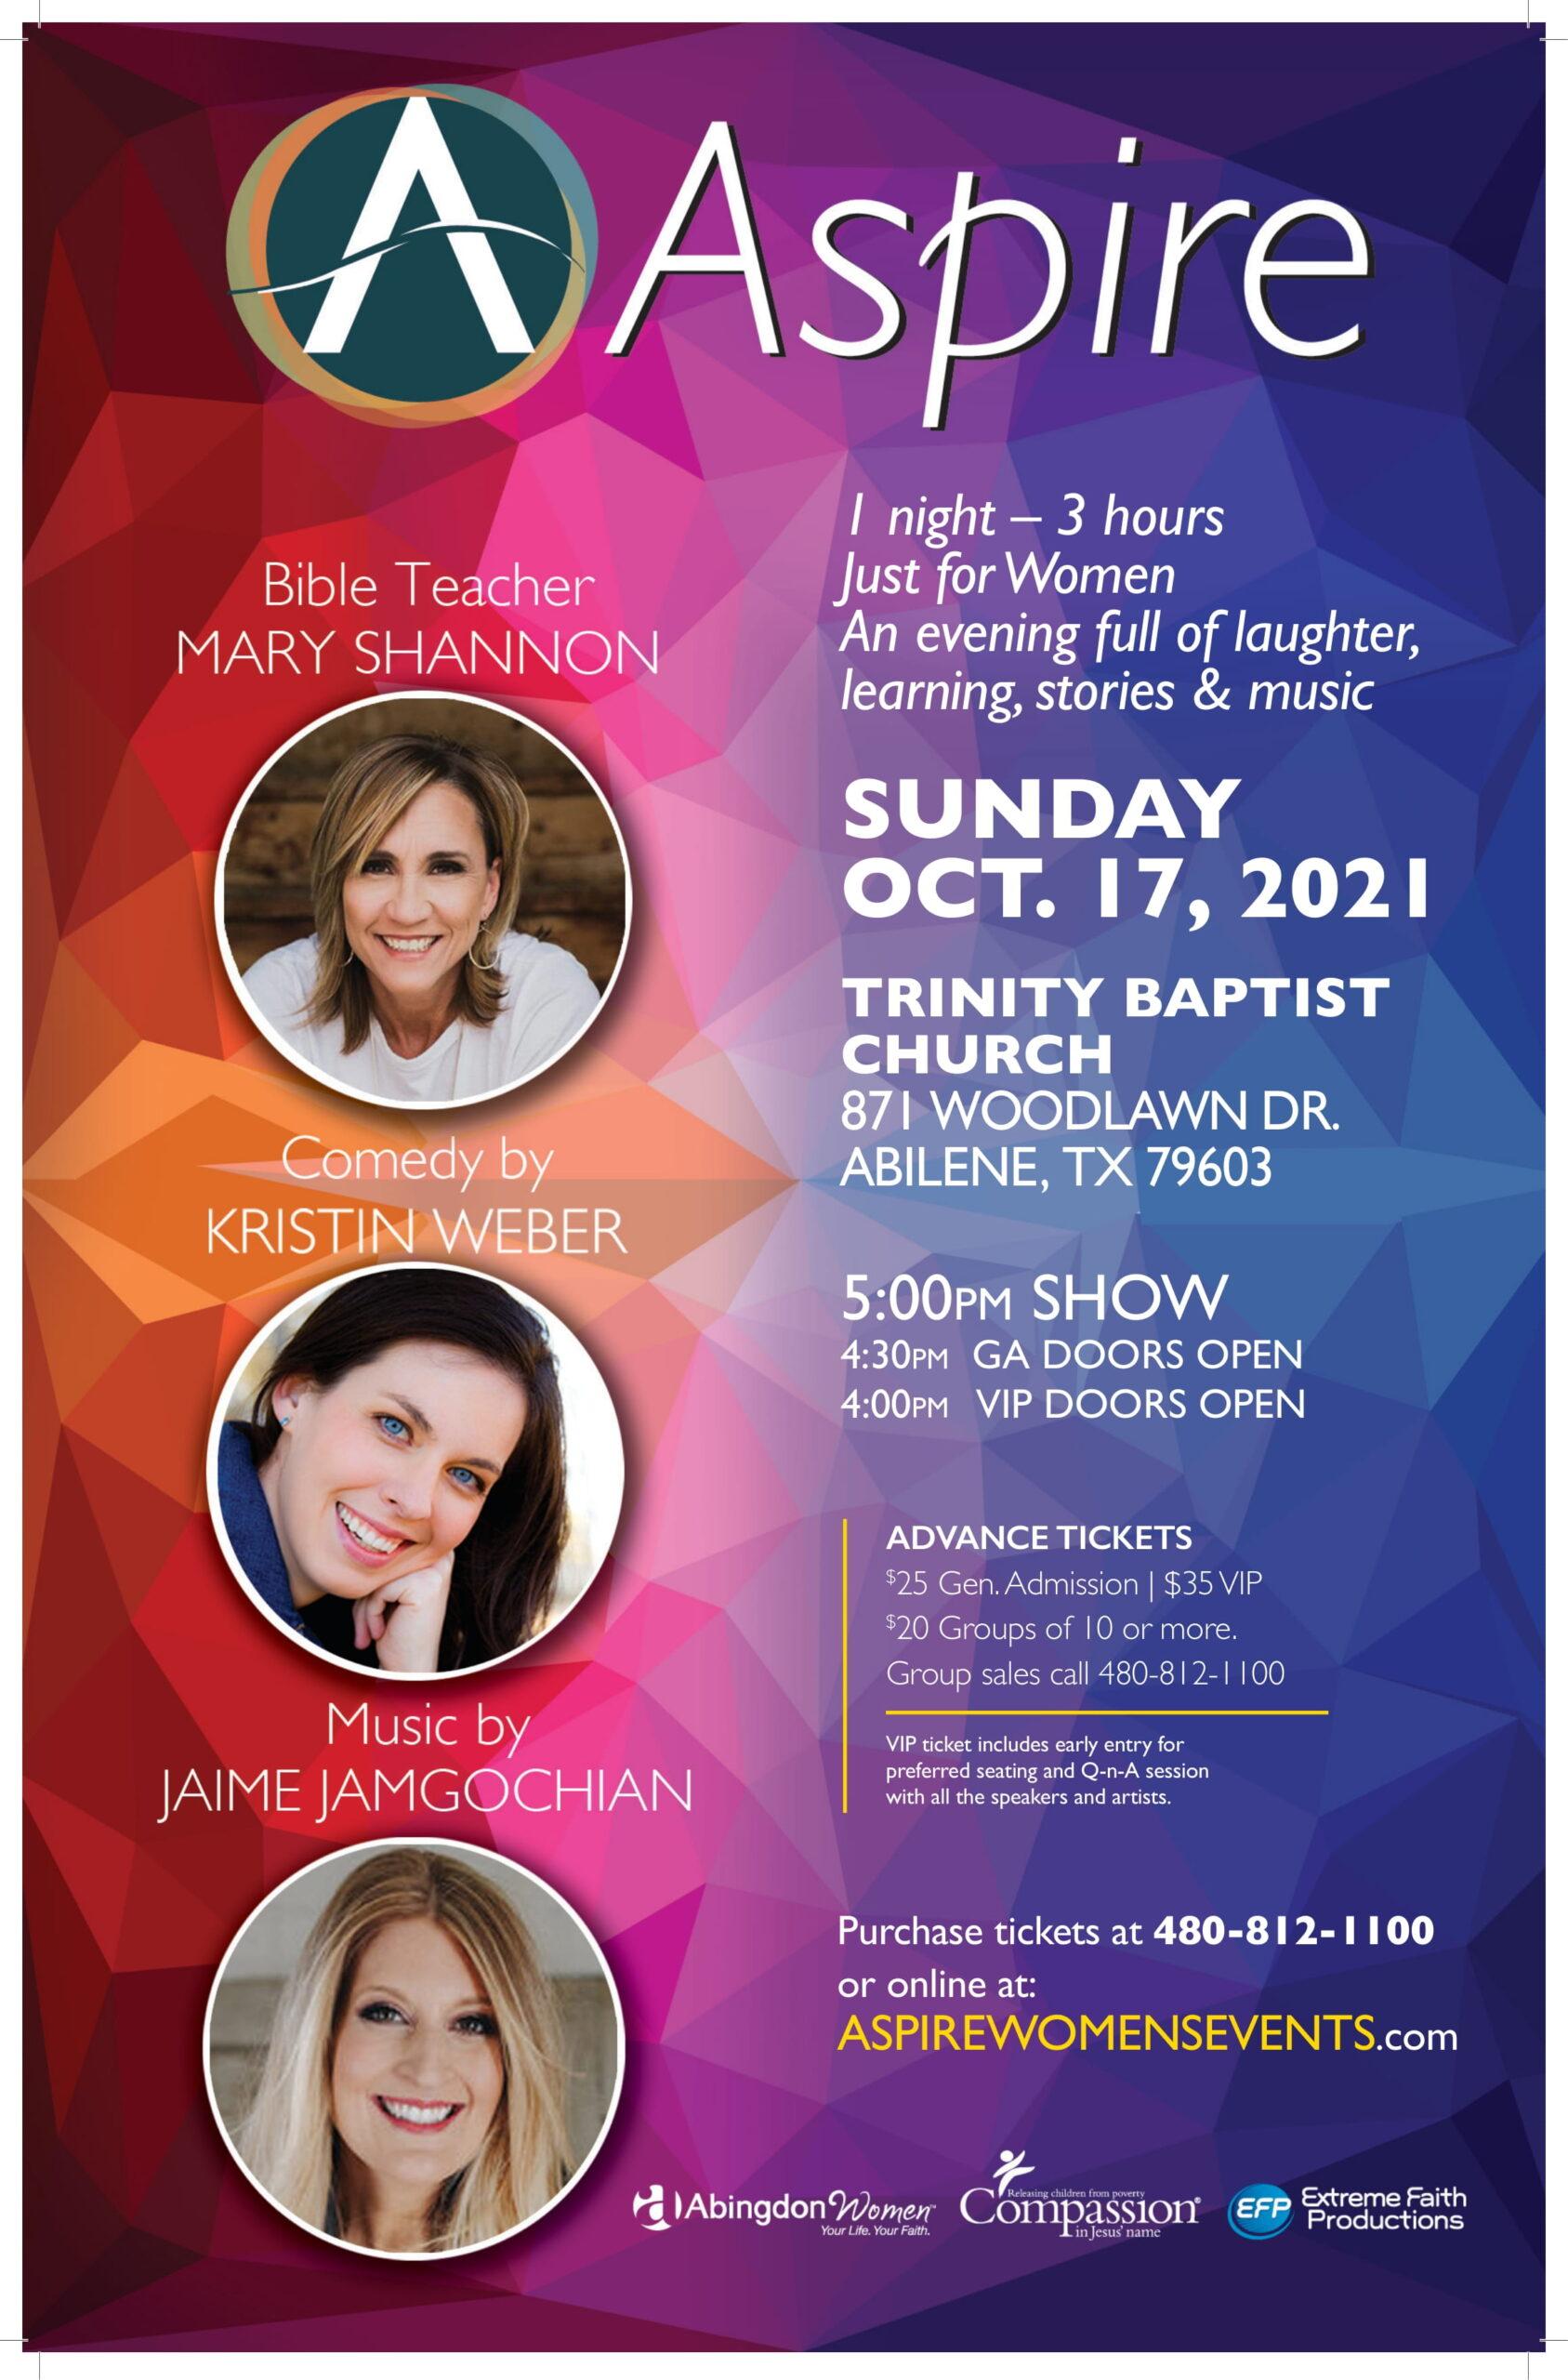 ASPIRE SUN Oct 17 Abilene TX-Poster